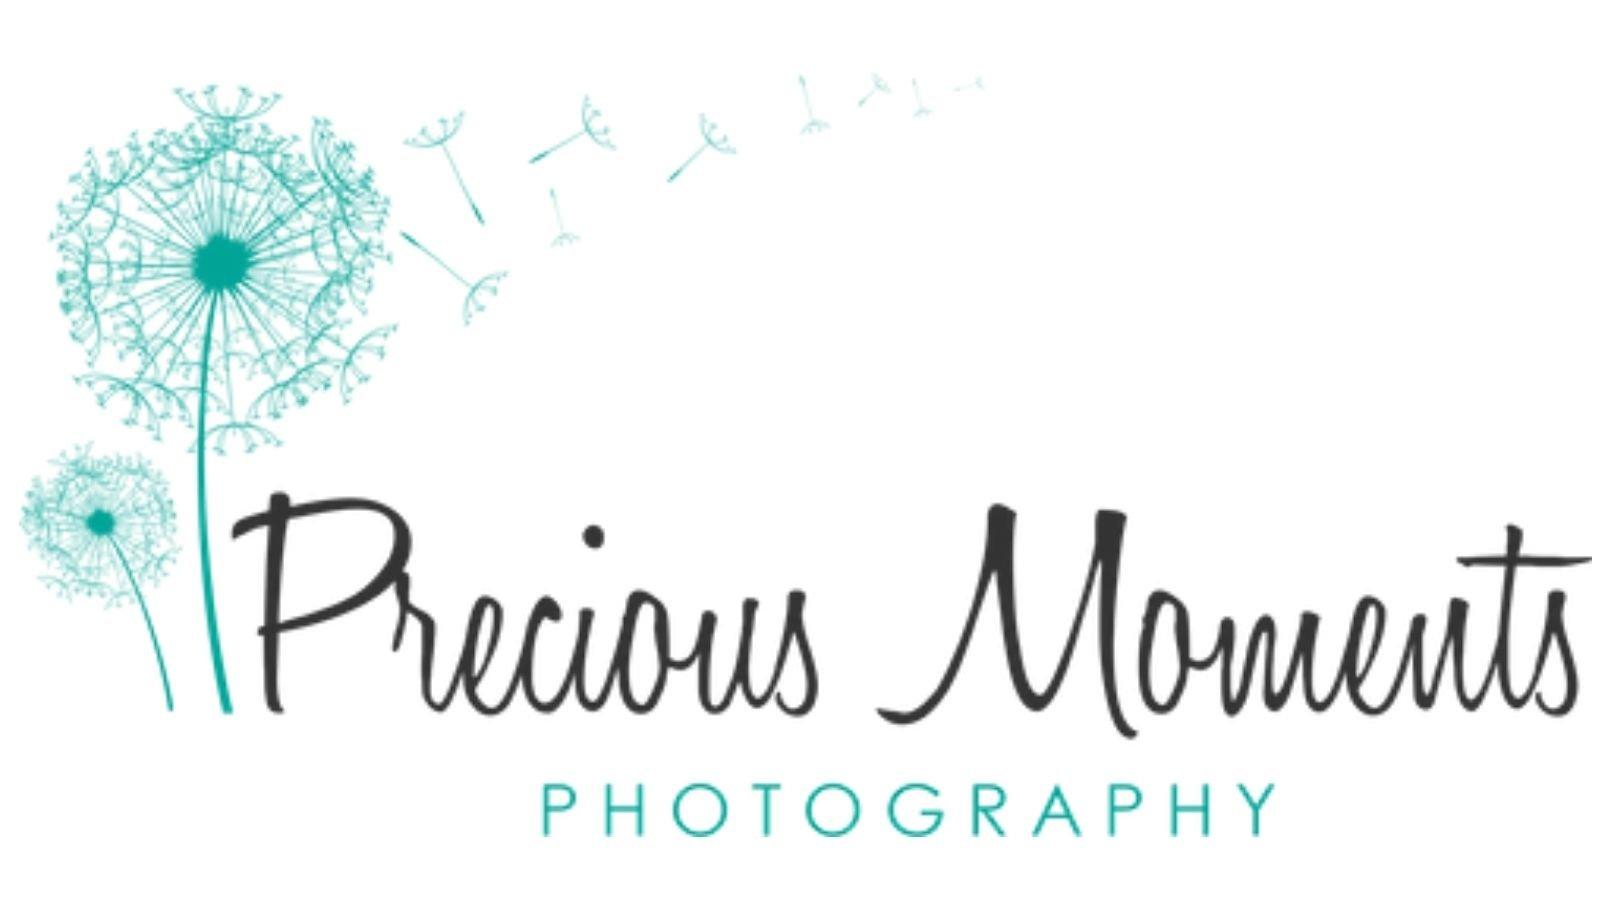 Precious Moments Photography